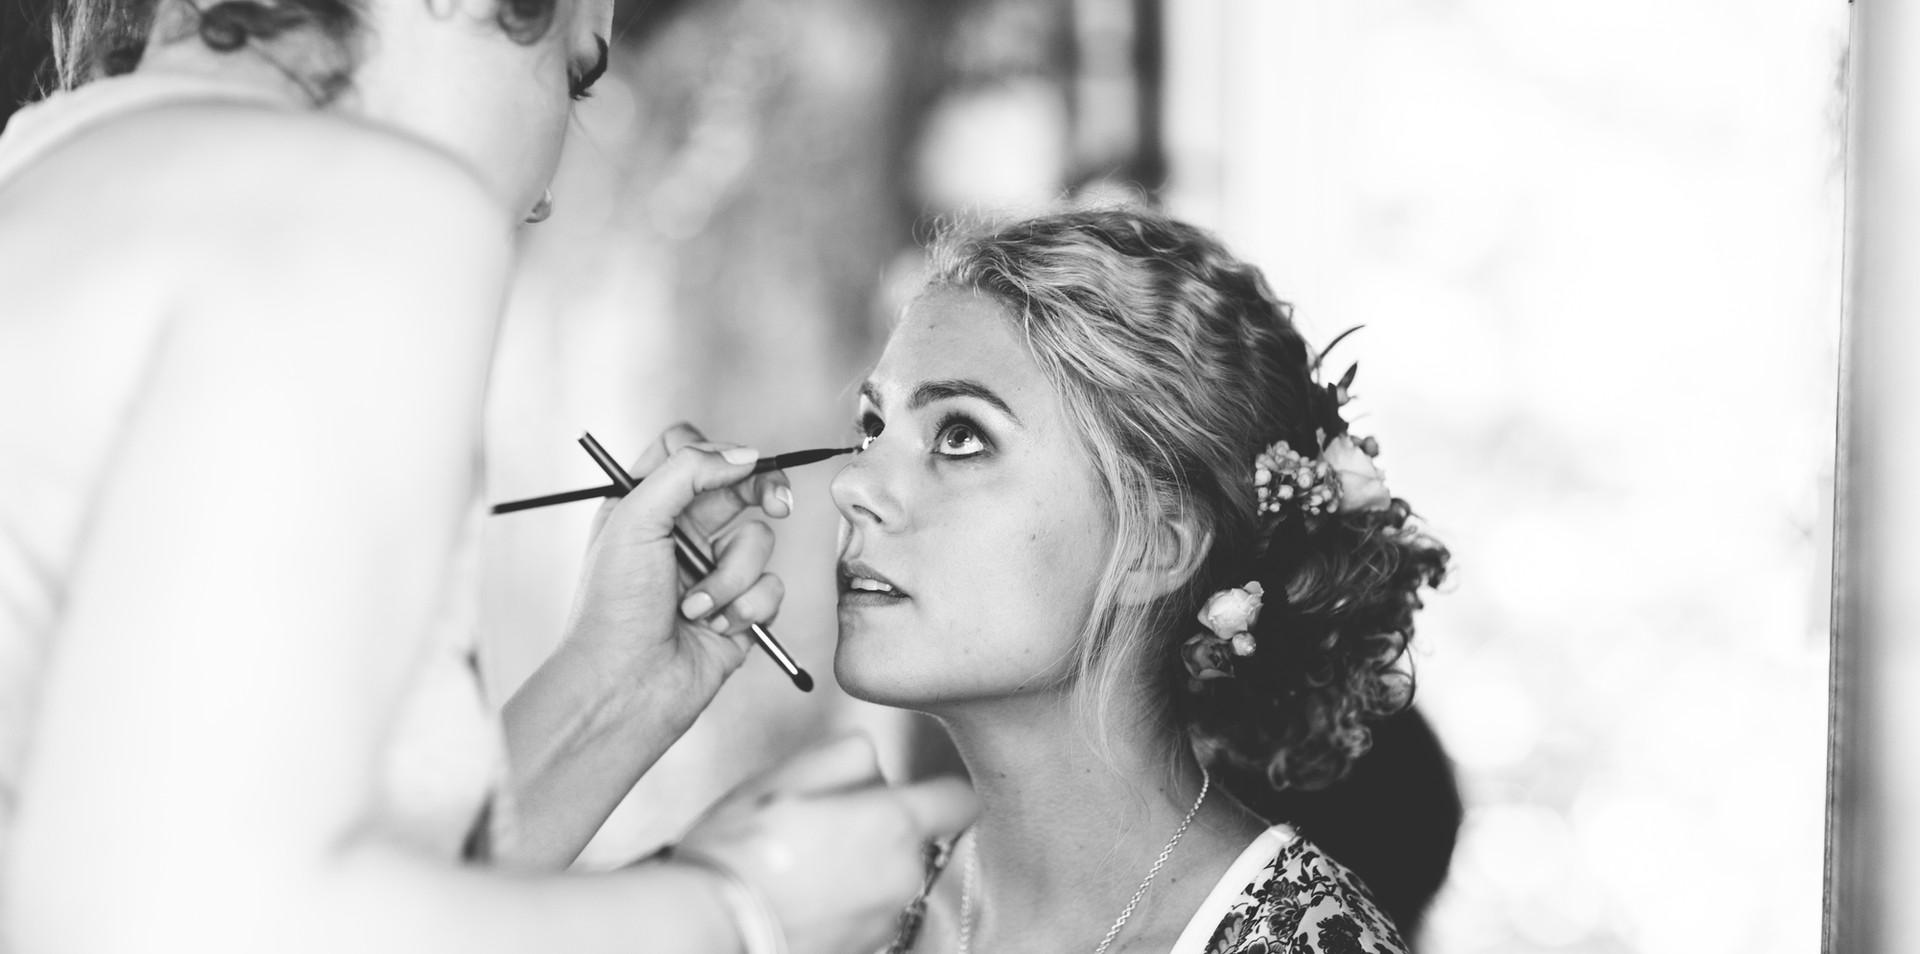 Makeup- Kelsi Bennett Photographer- nataliepulspixieset.com